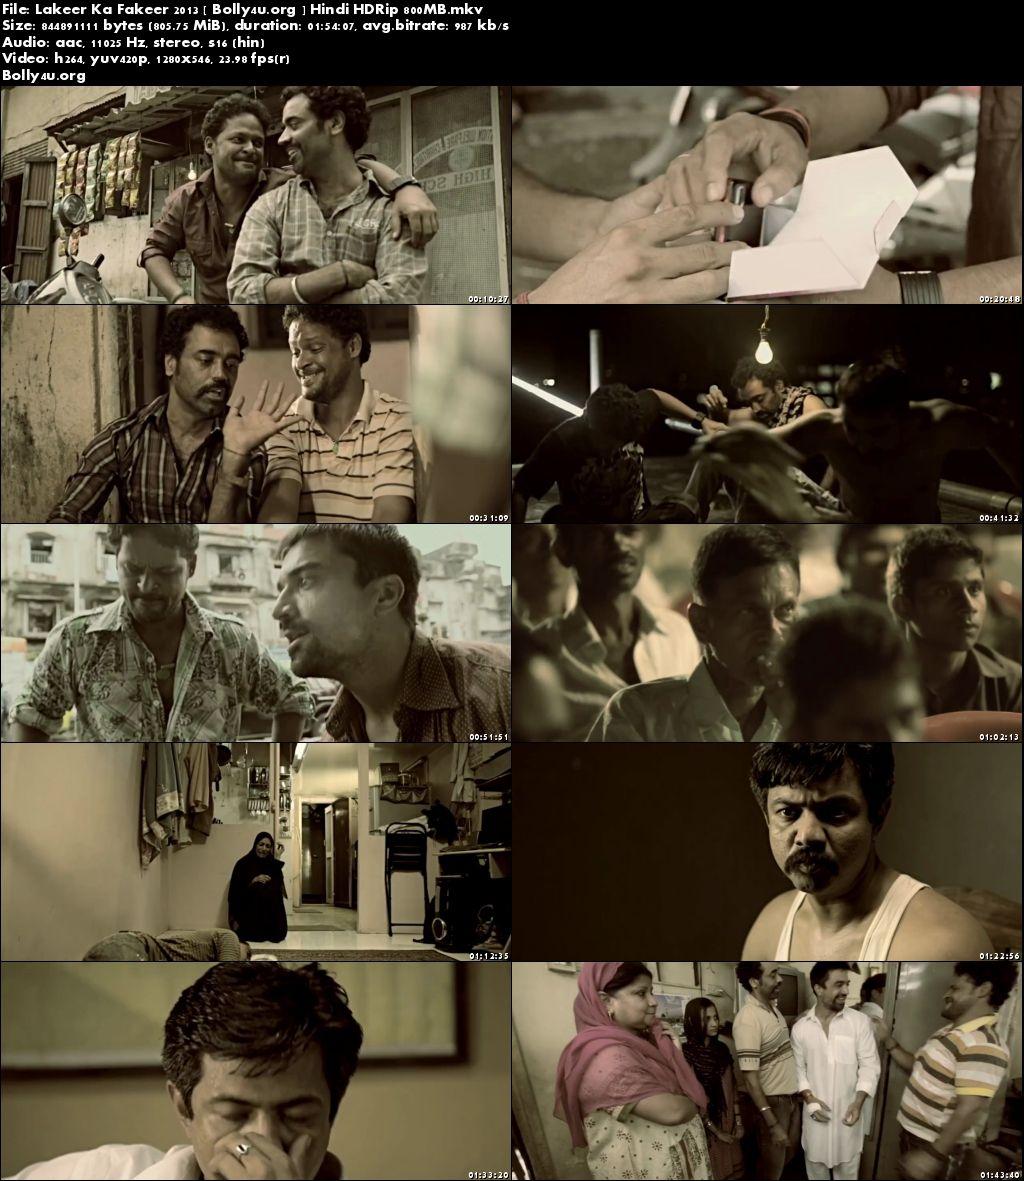 Lakeer Ka Fakeer 2013 HDRip 800MB Hindi Movie 720p Download